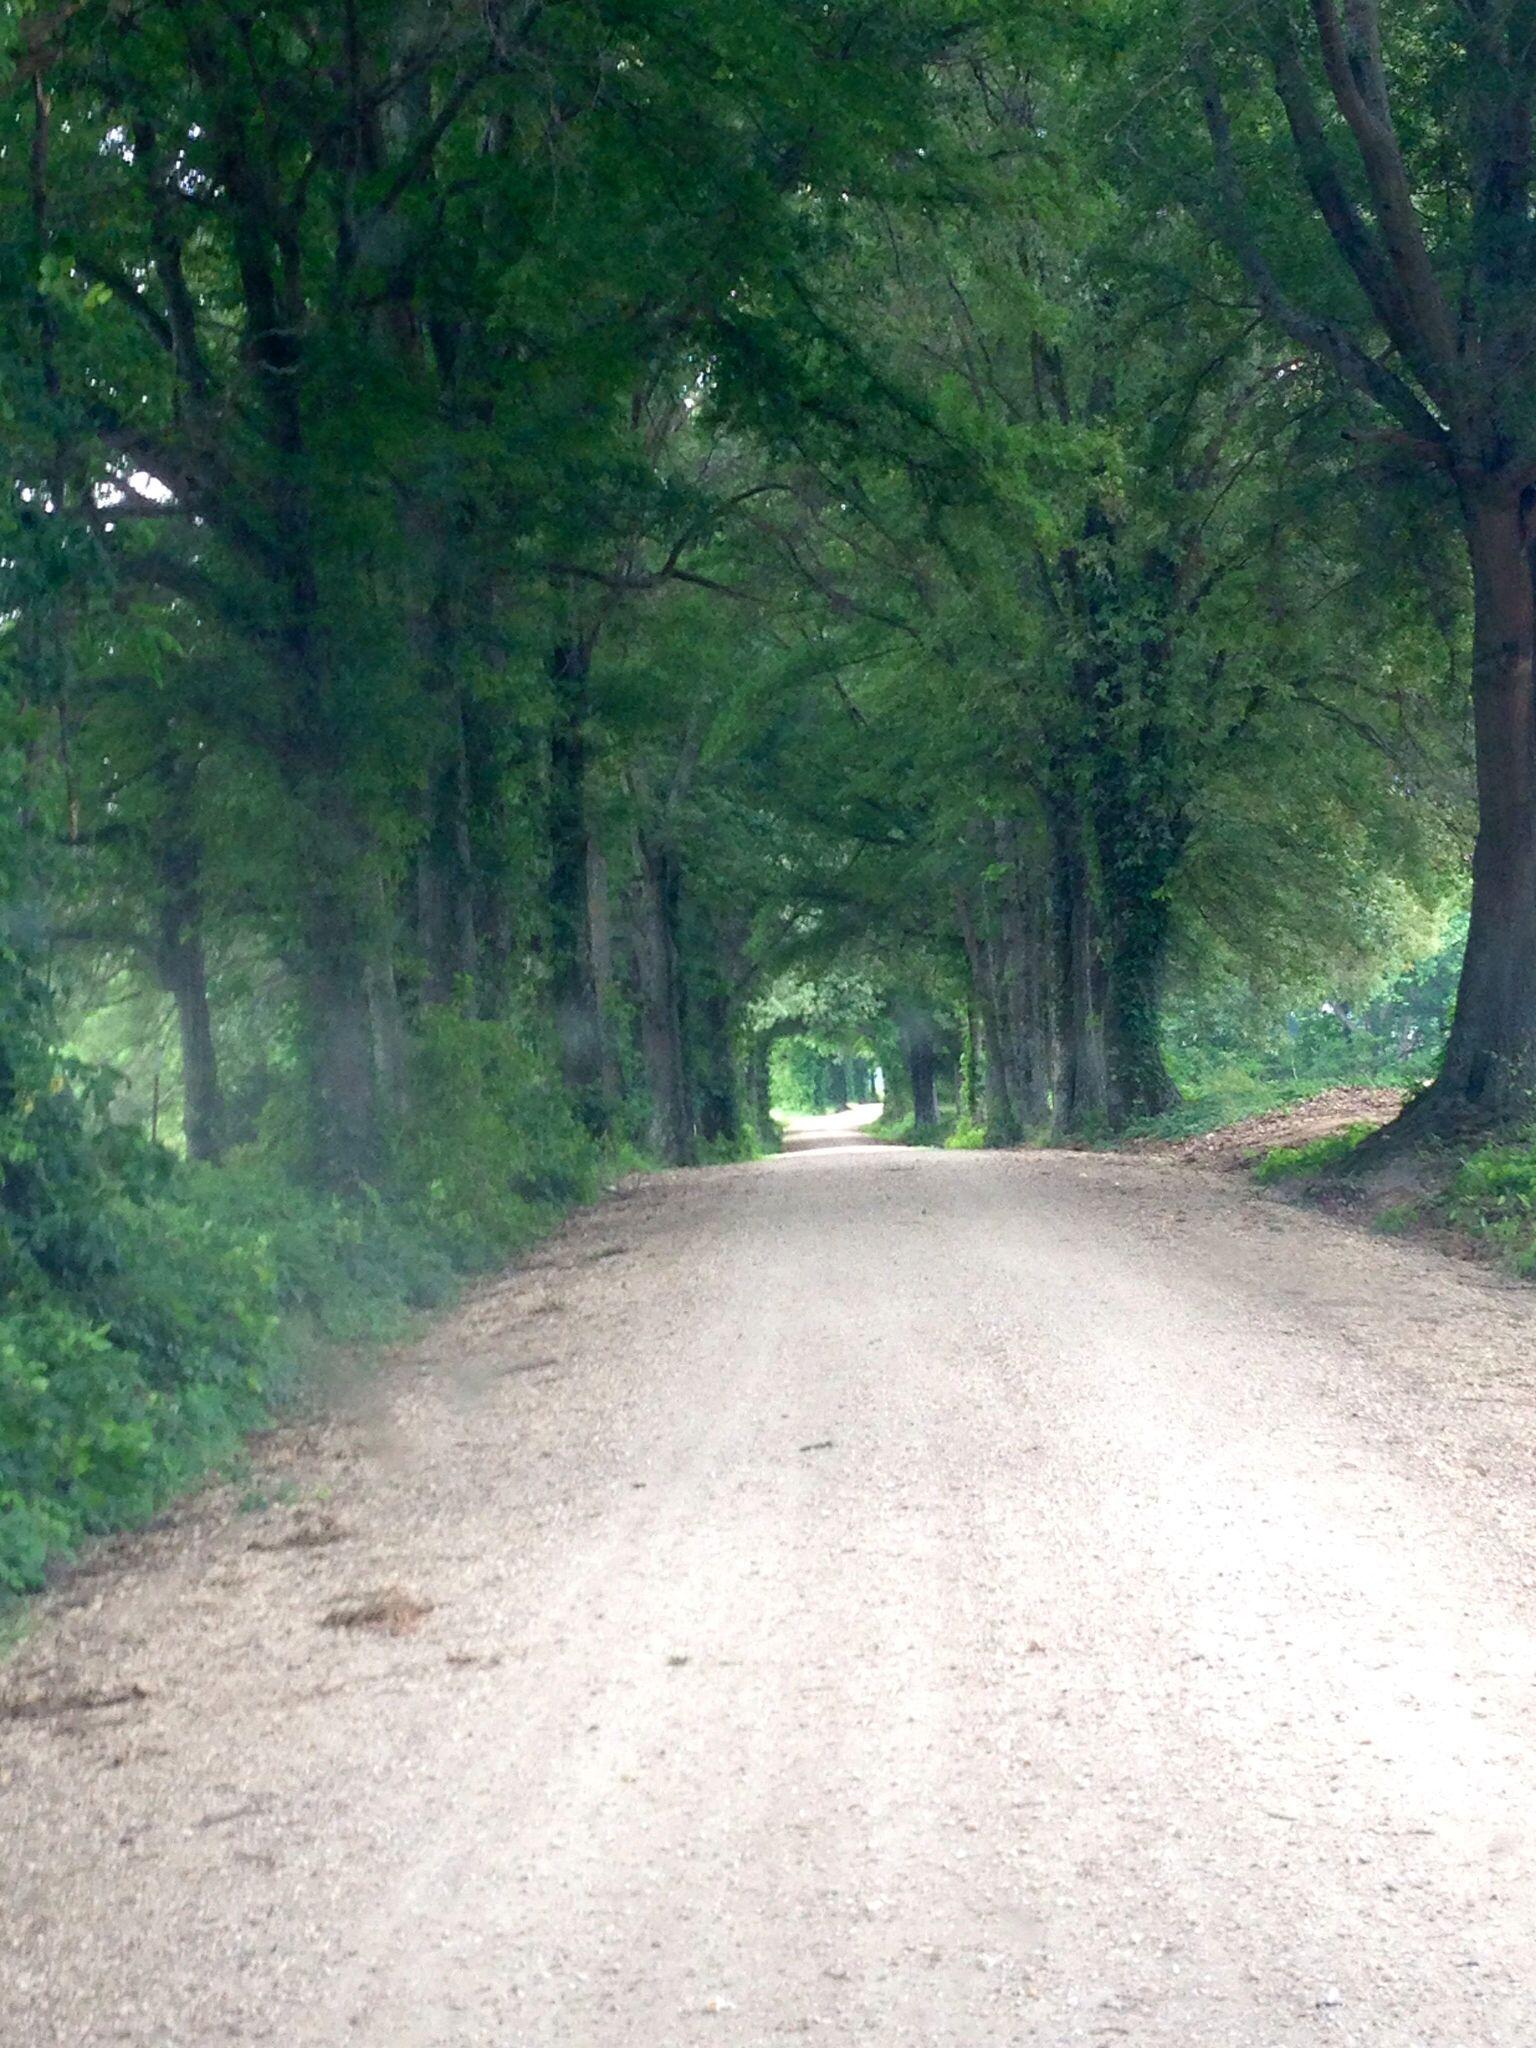 I love roads like this...I always drive slow down them. sixmillionstories.com